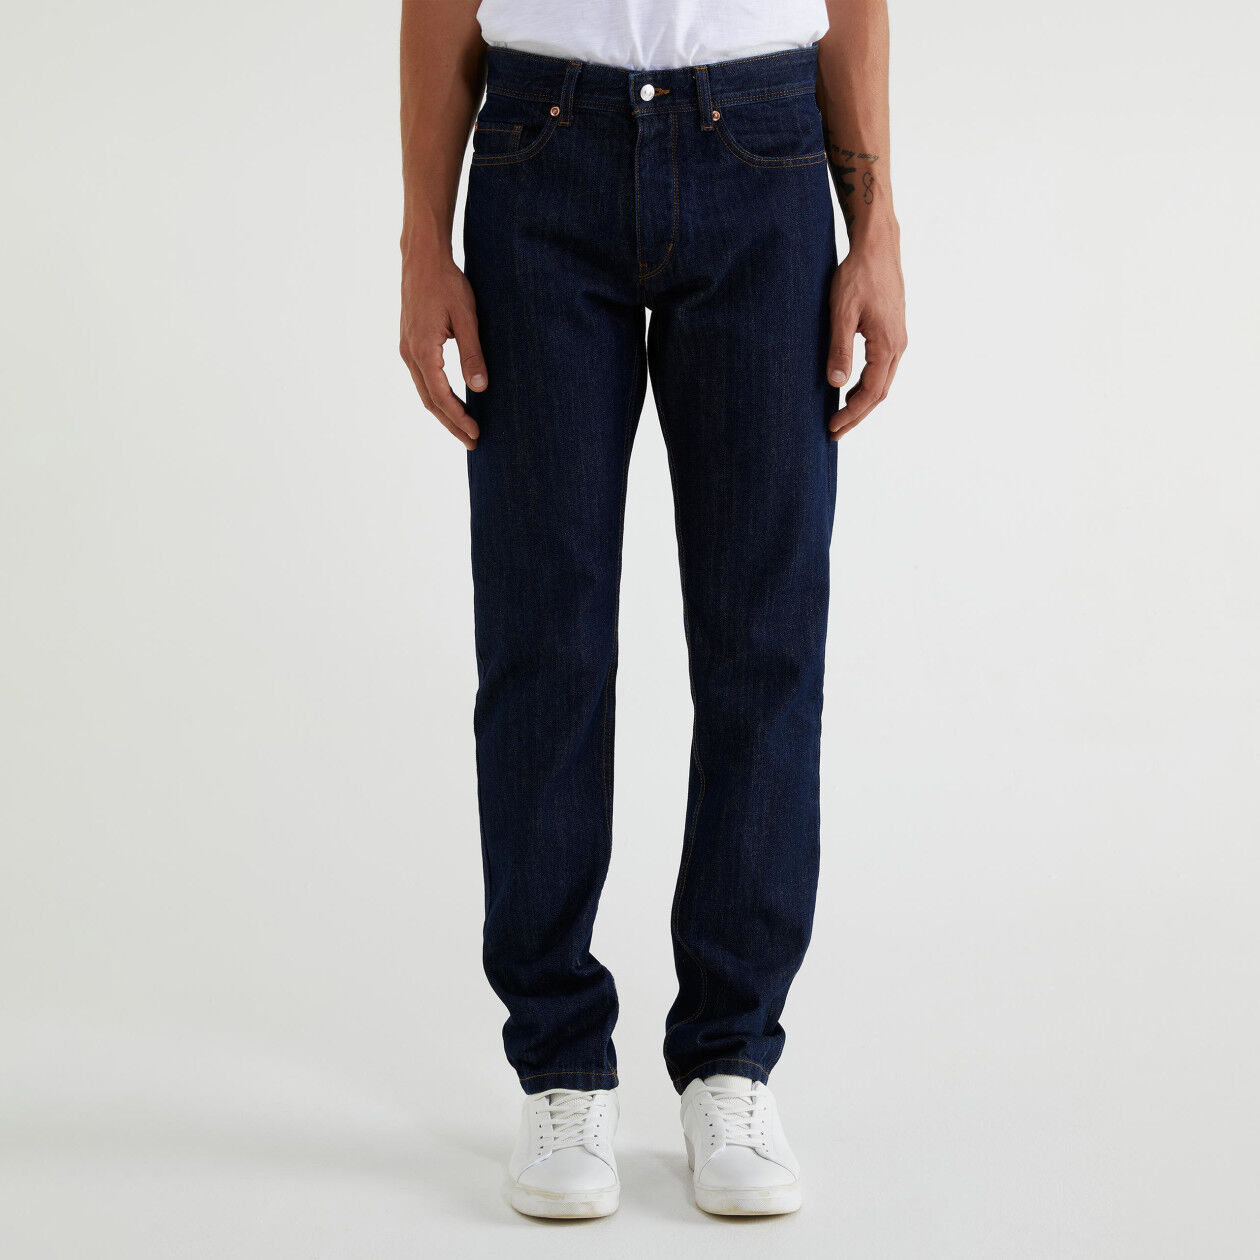 Five pocket straight leg jeans